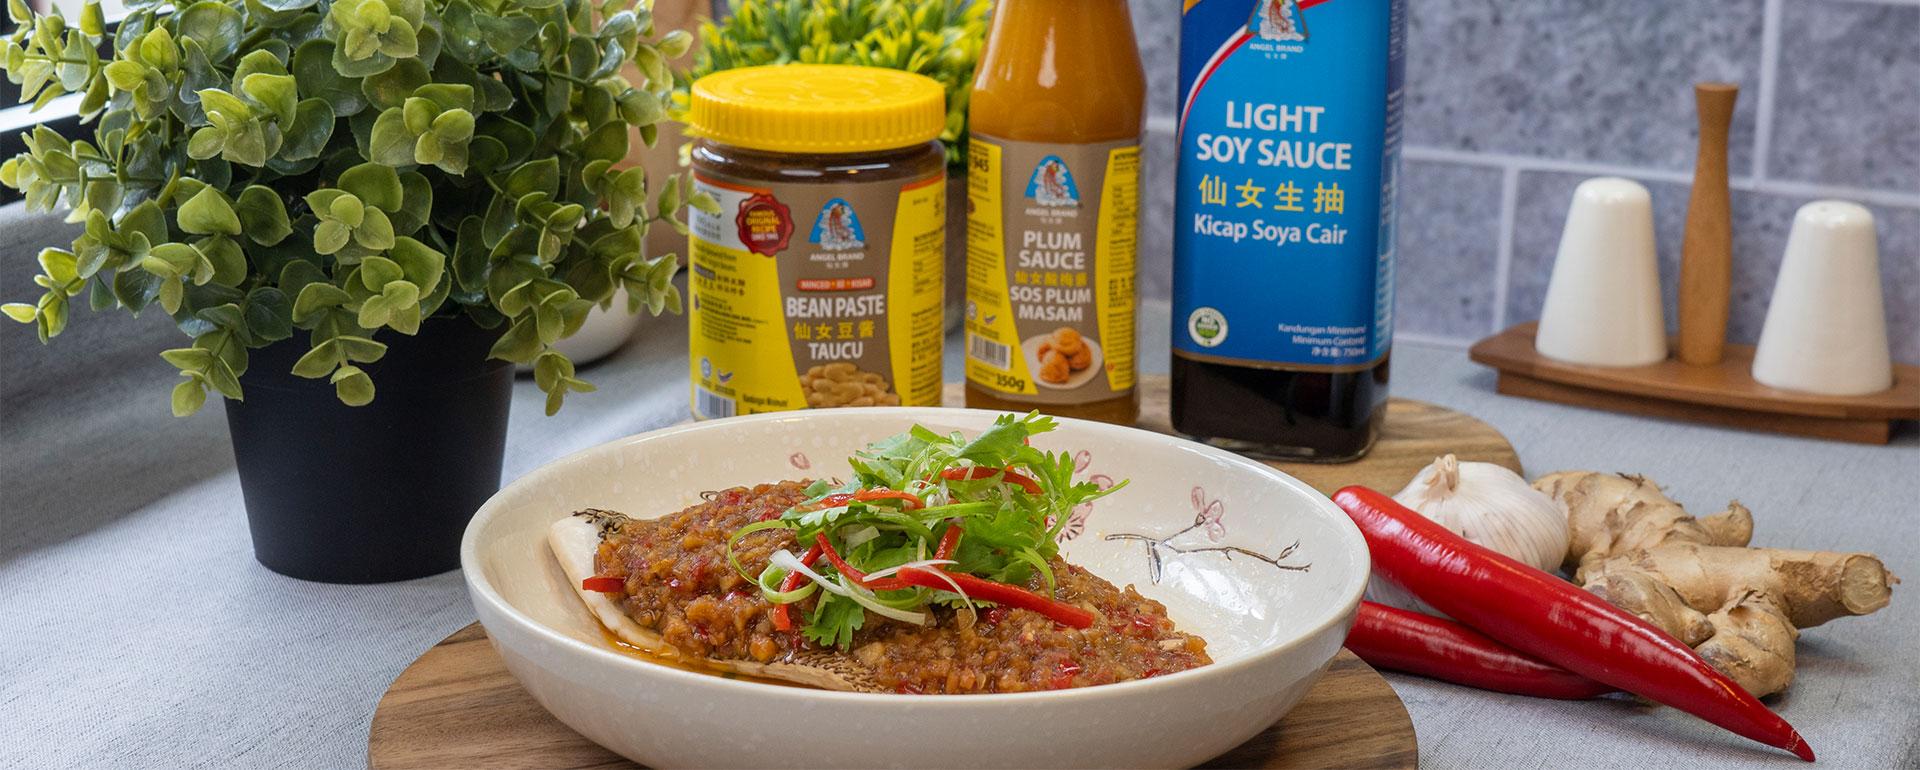 Spicy-Bean-Paste-Steamed-Fish